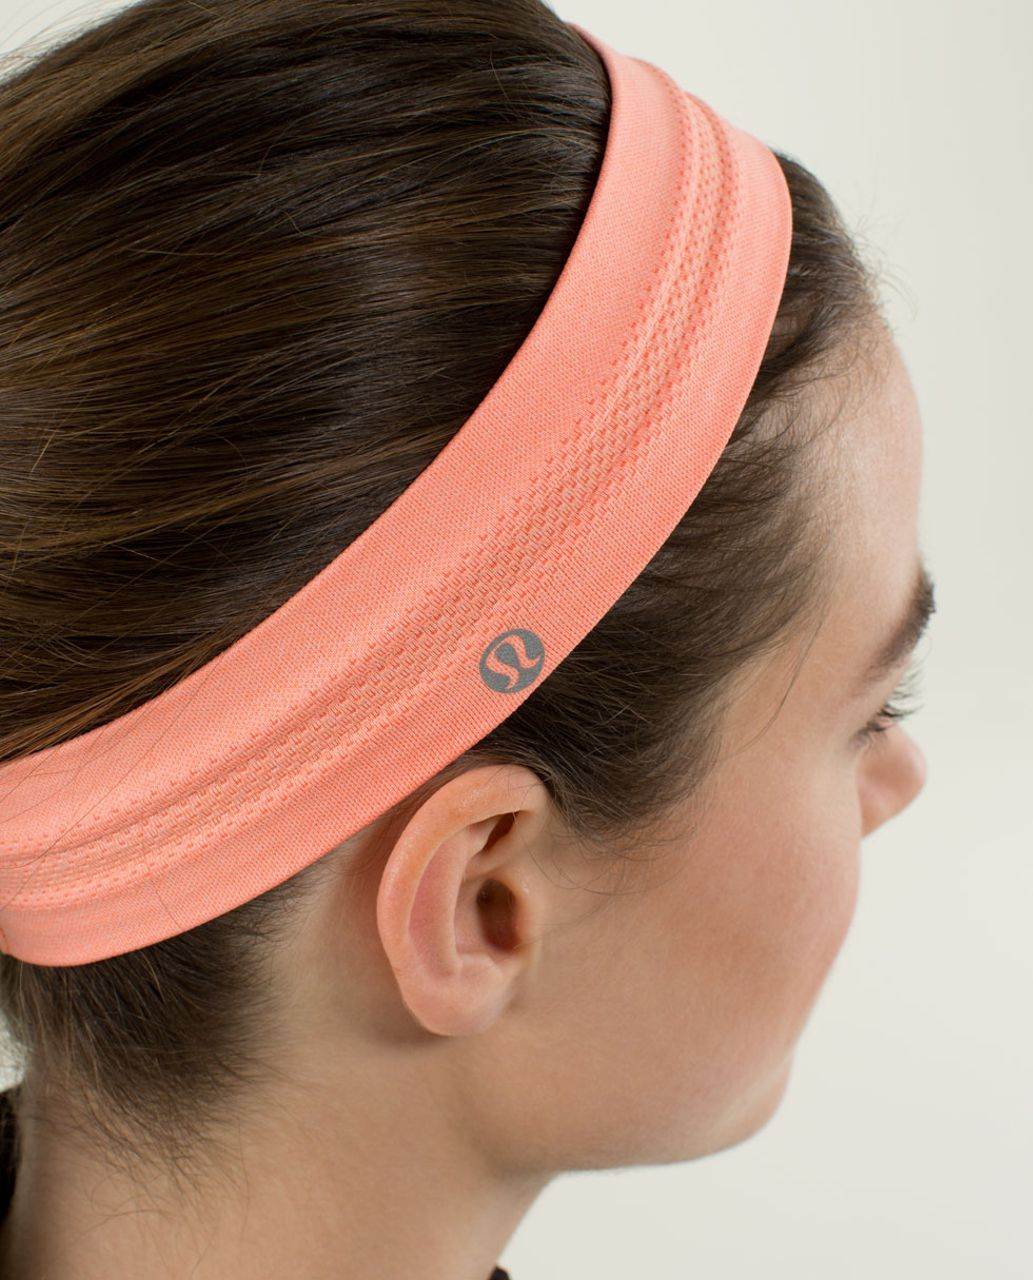 Lululemon Swiftly Headband - Heathered Very Light Flare